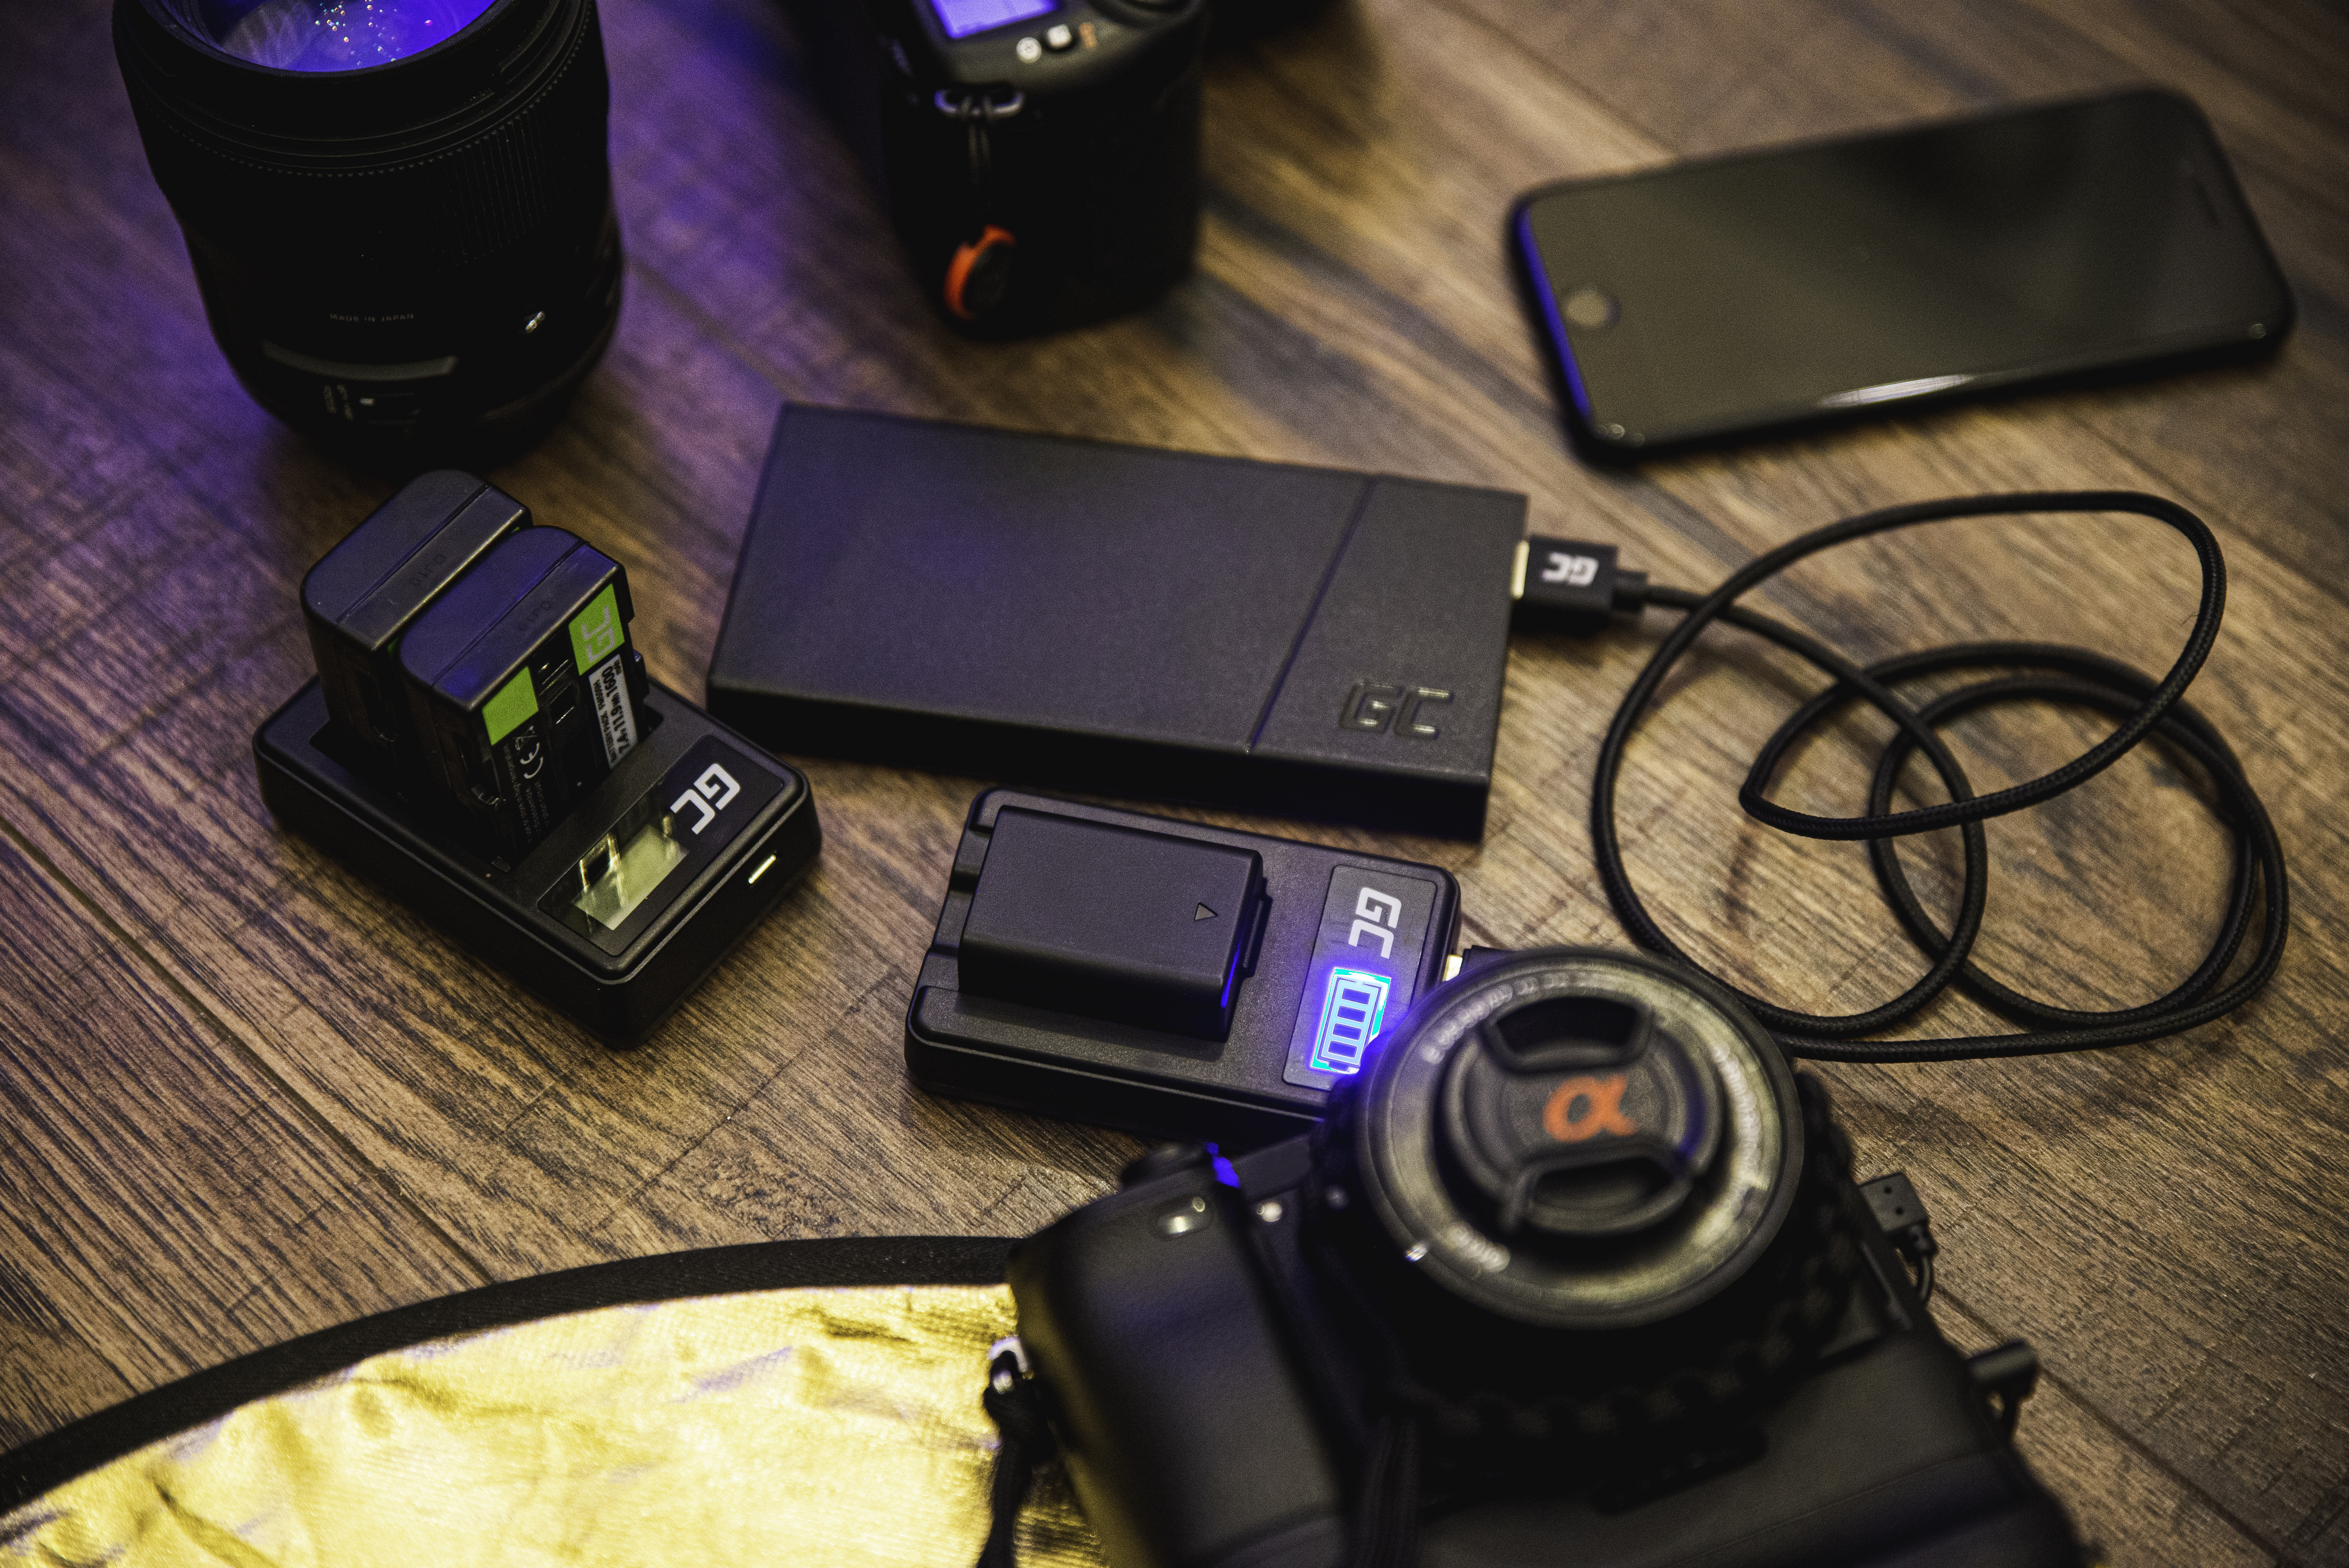 Baterie Green Cell Sony DSC H10 H20 H50 HX5 HX10 T50 W50 W70 3.7V 1100mAh Li-ion - neoriginální